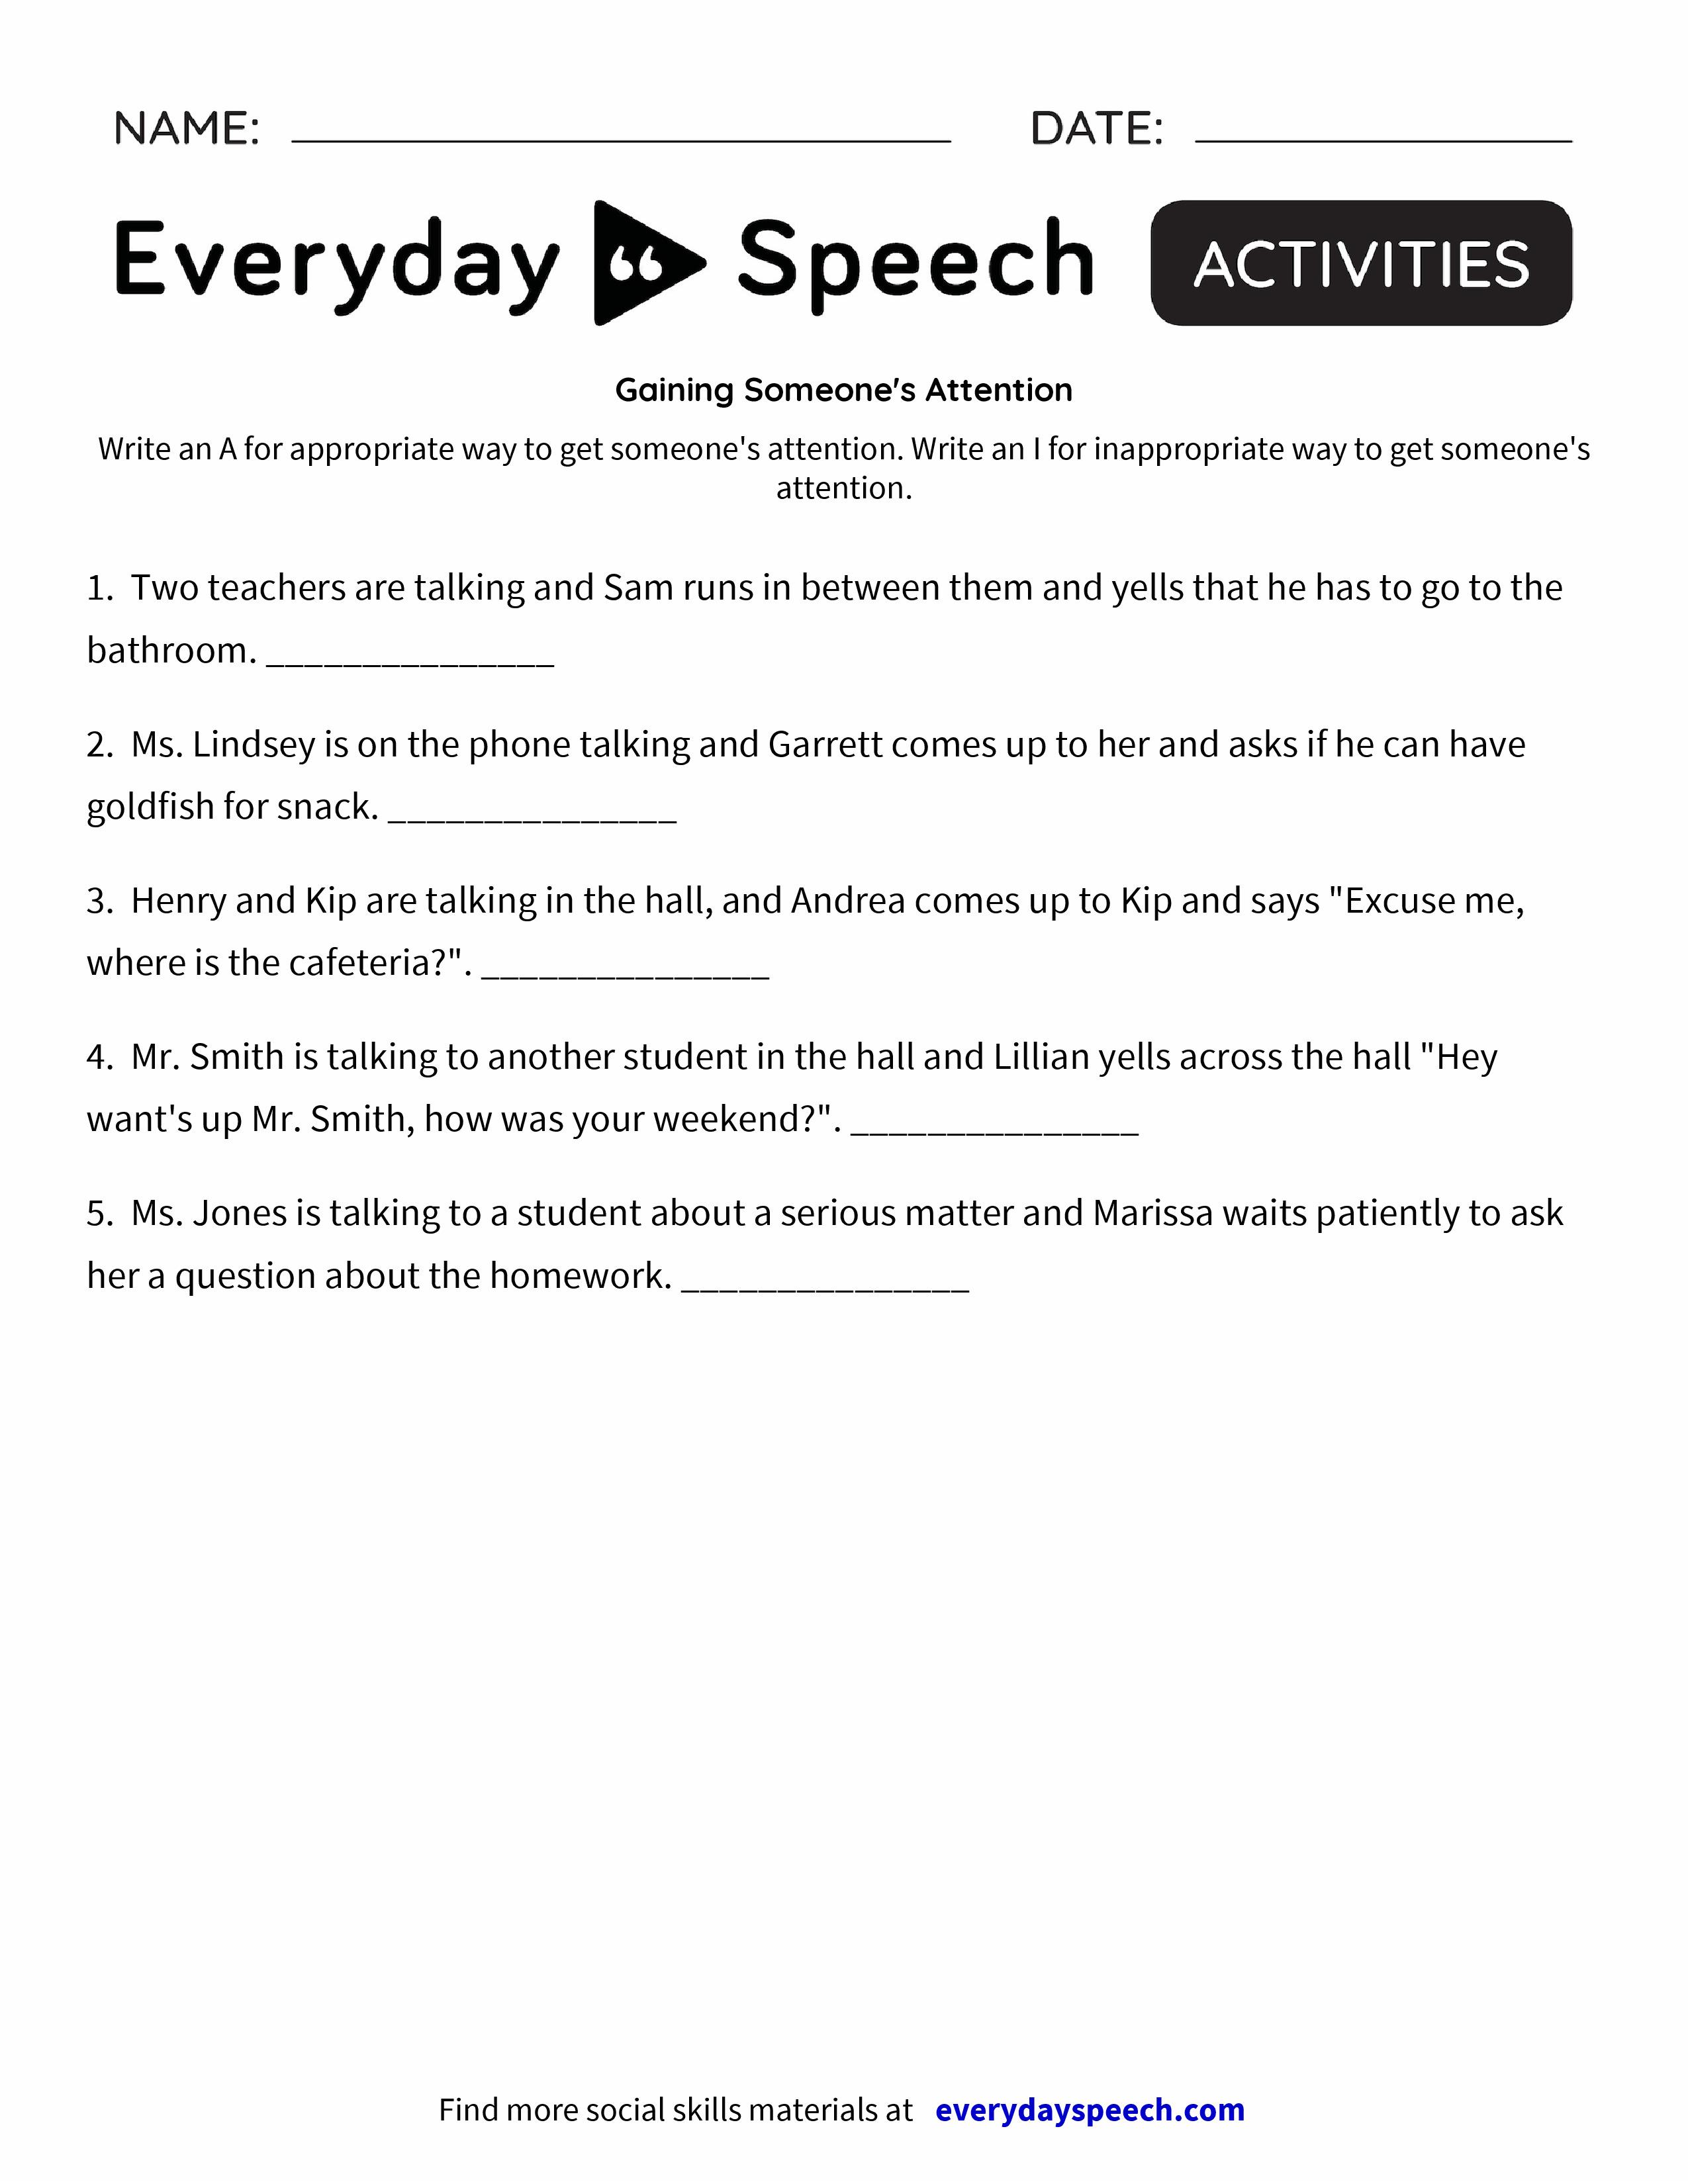 Getting the Teacher's Attention Exit Slip - Everyday Speech ...